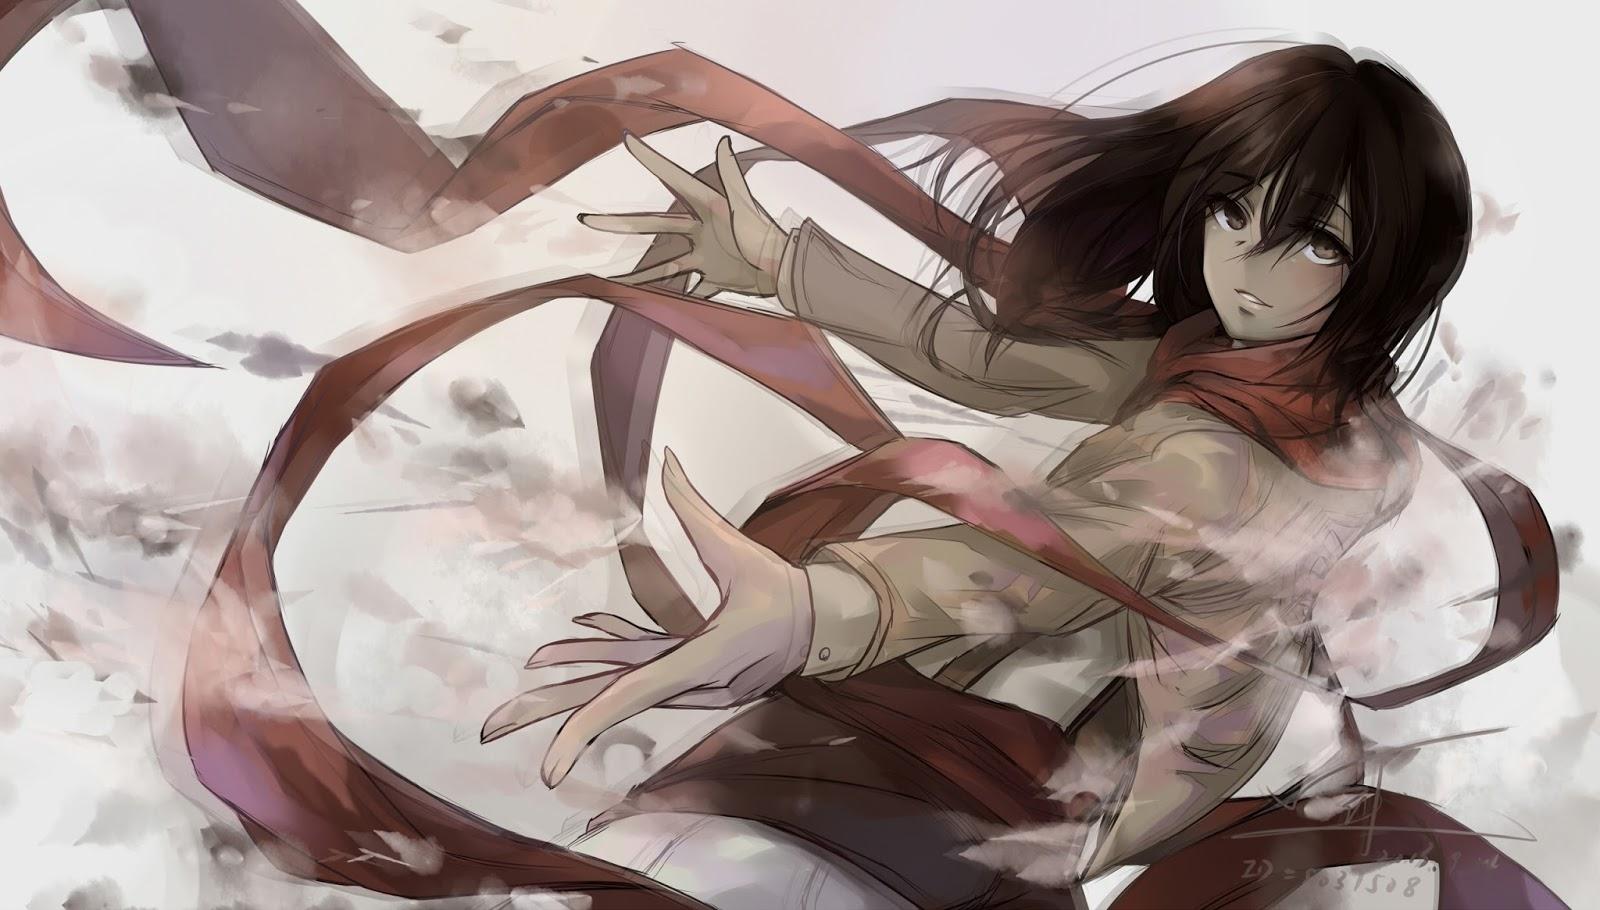 Attack on Titan Shingeki no Kyojin Girl Anime HD Wallpaper Backgrounds 1600x910